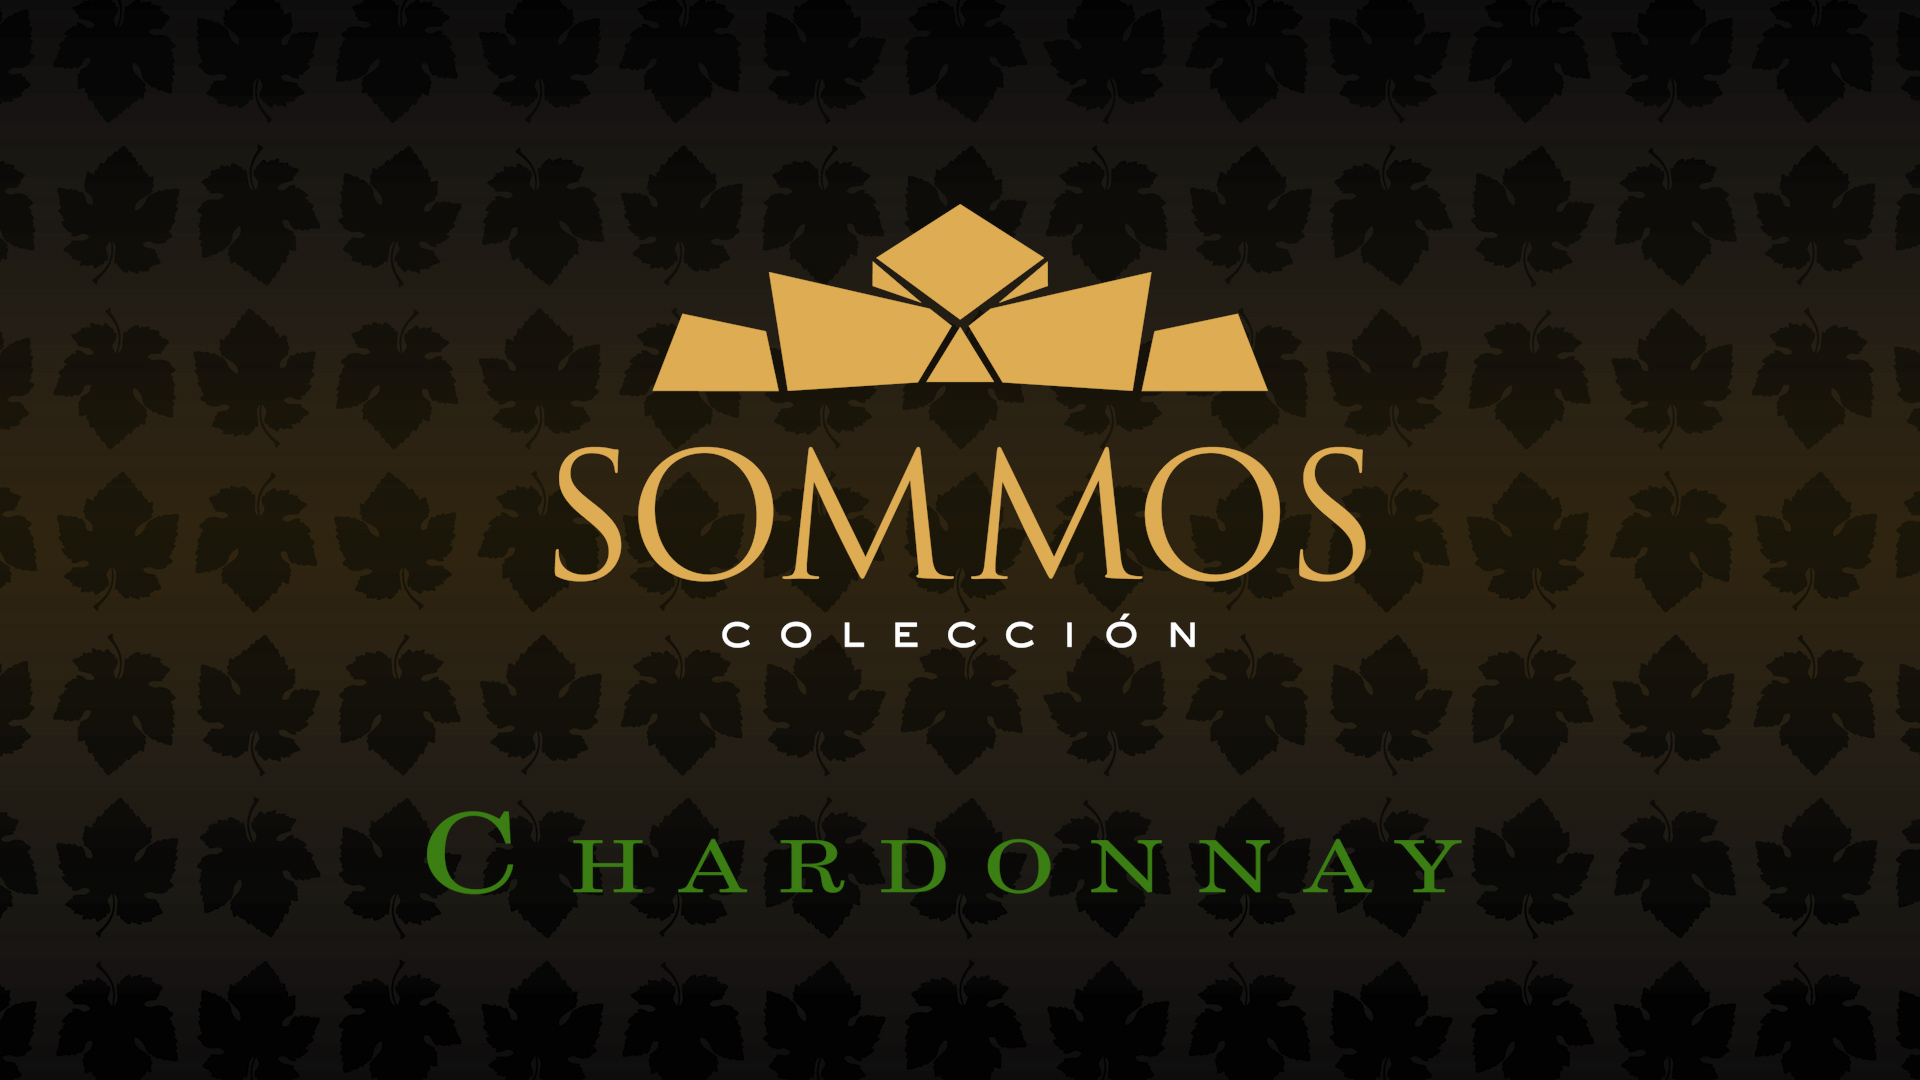 SOMMOS Colección - Chardonnay